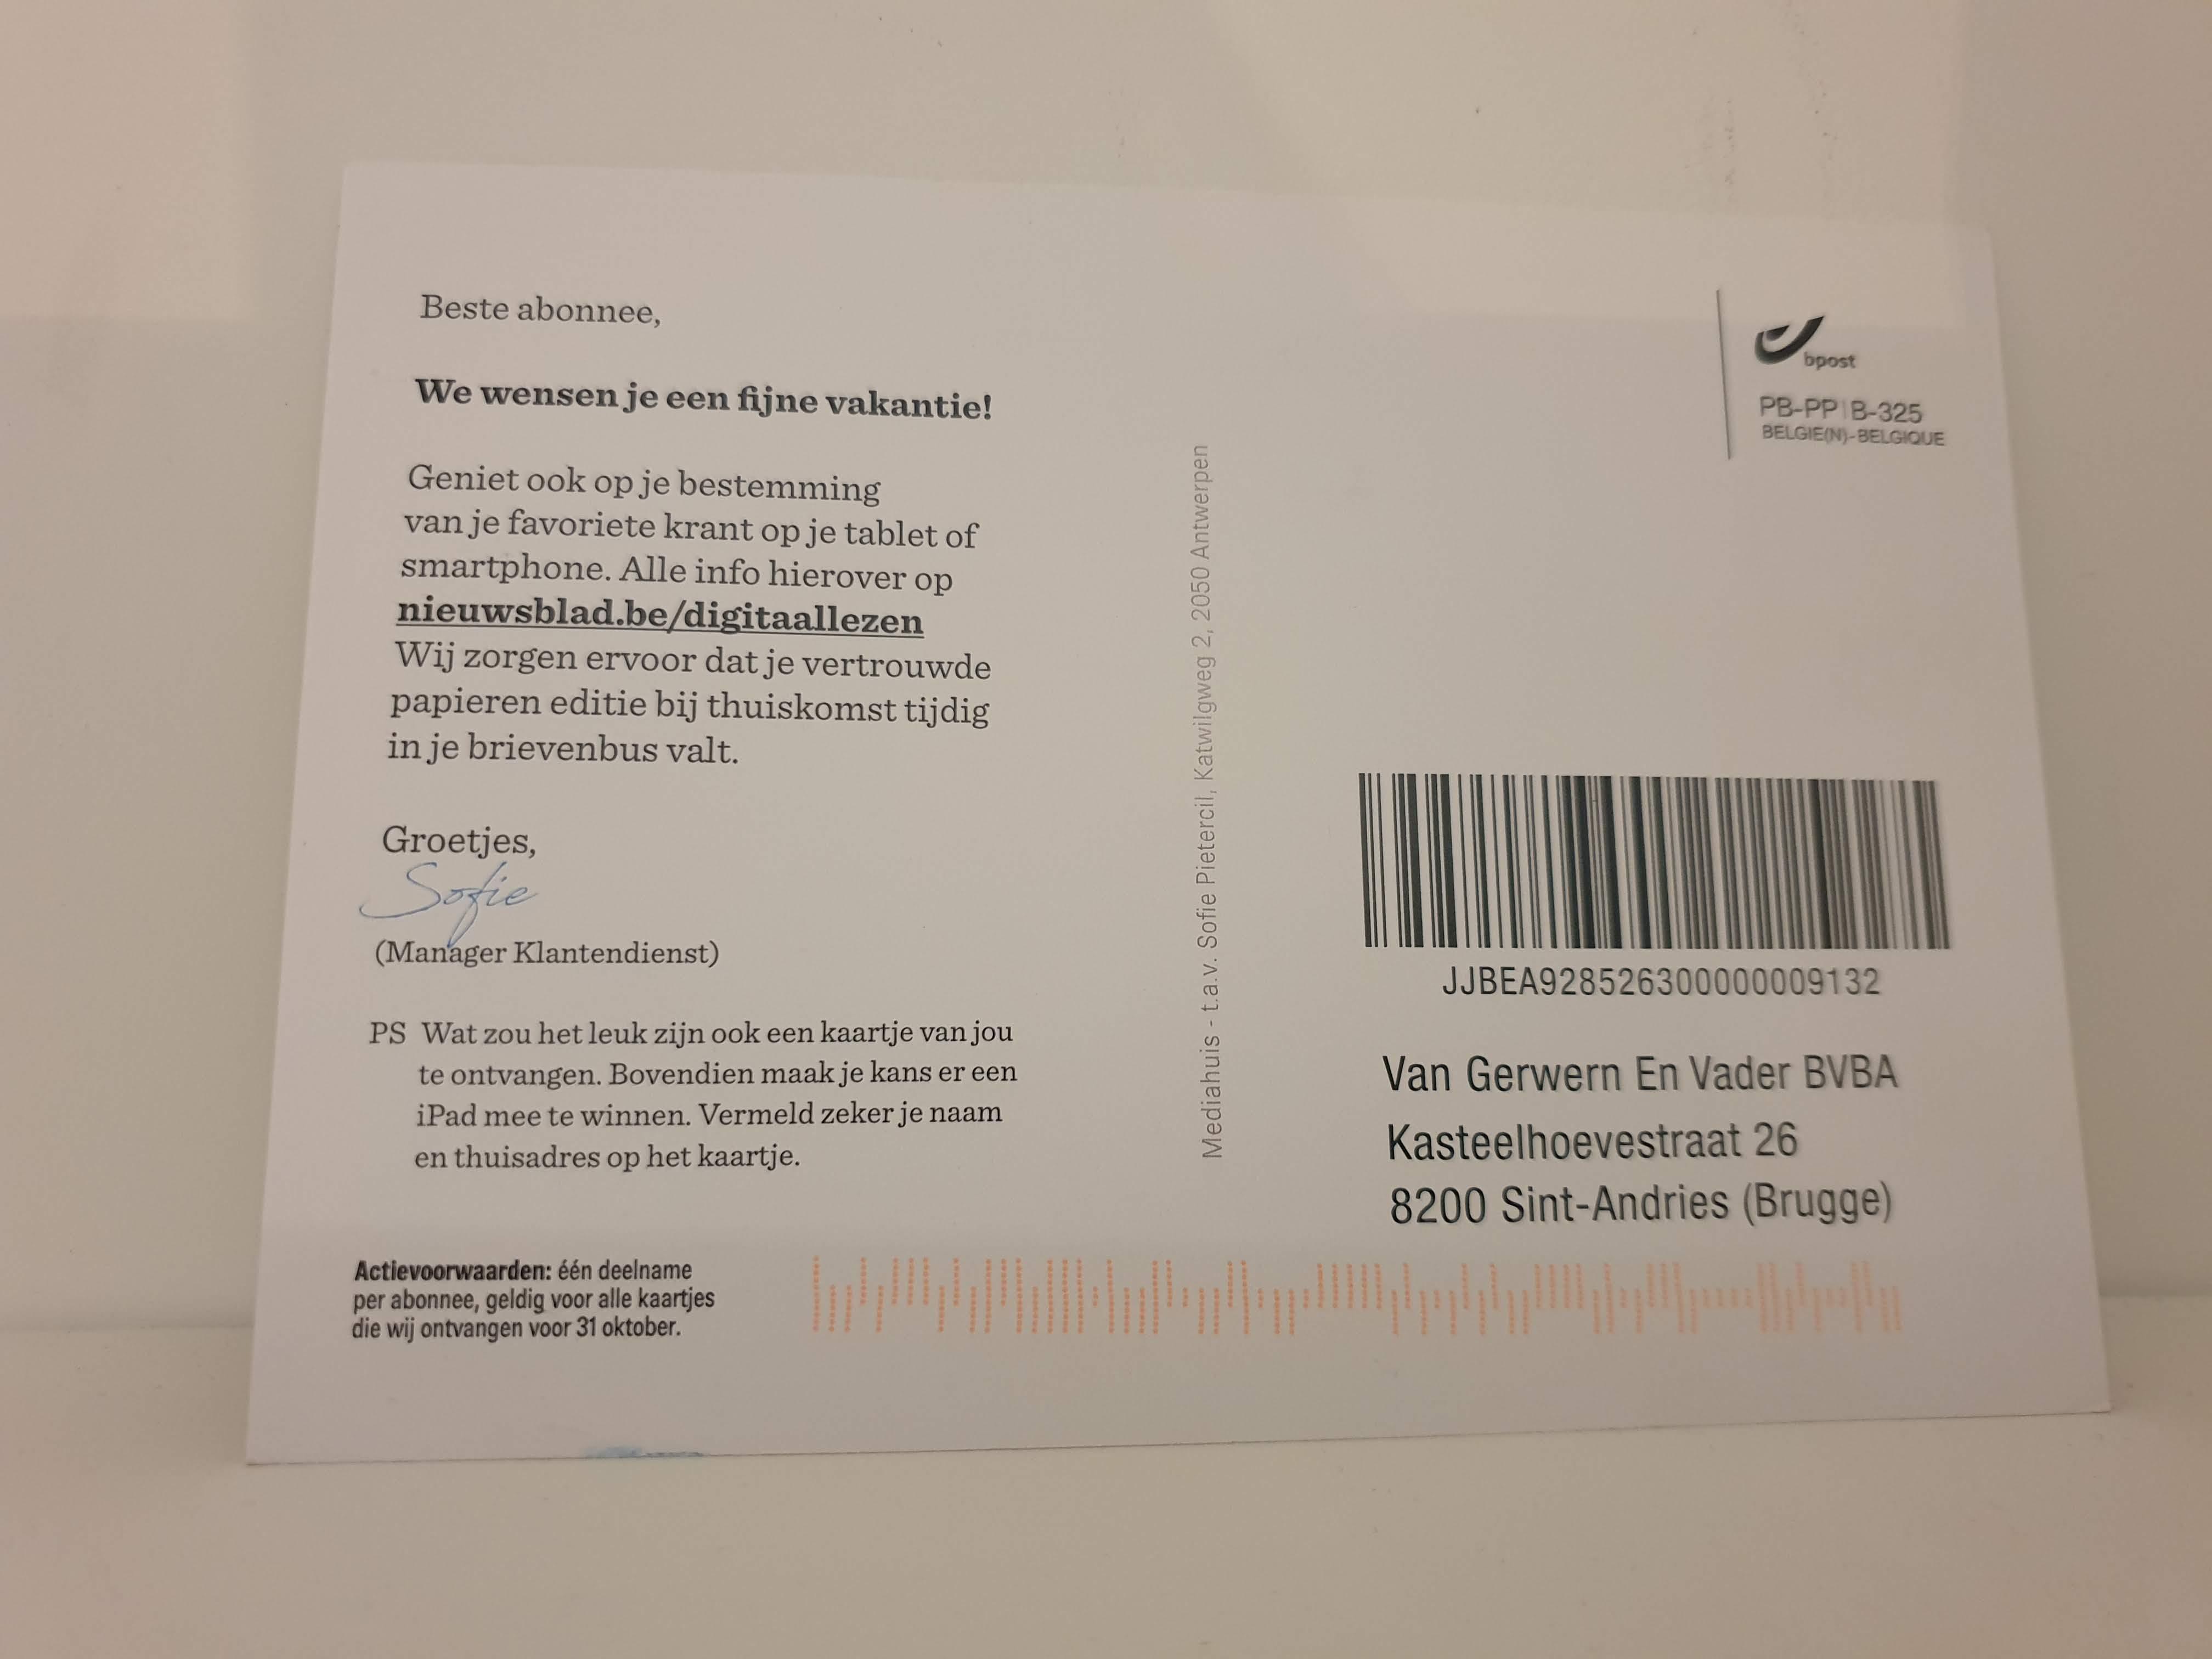 Nieuwsblad-Postcard-Momentum-RelationalMarketing-2